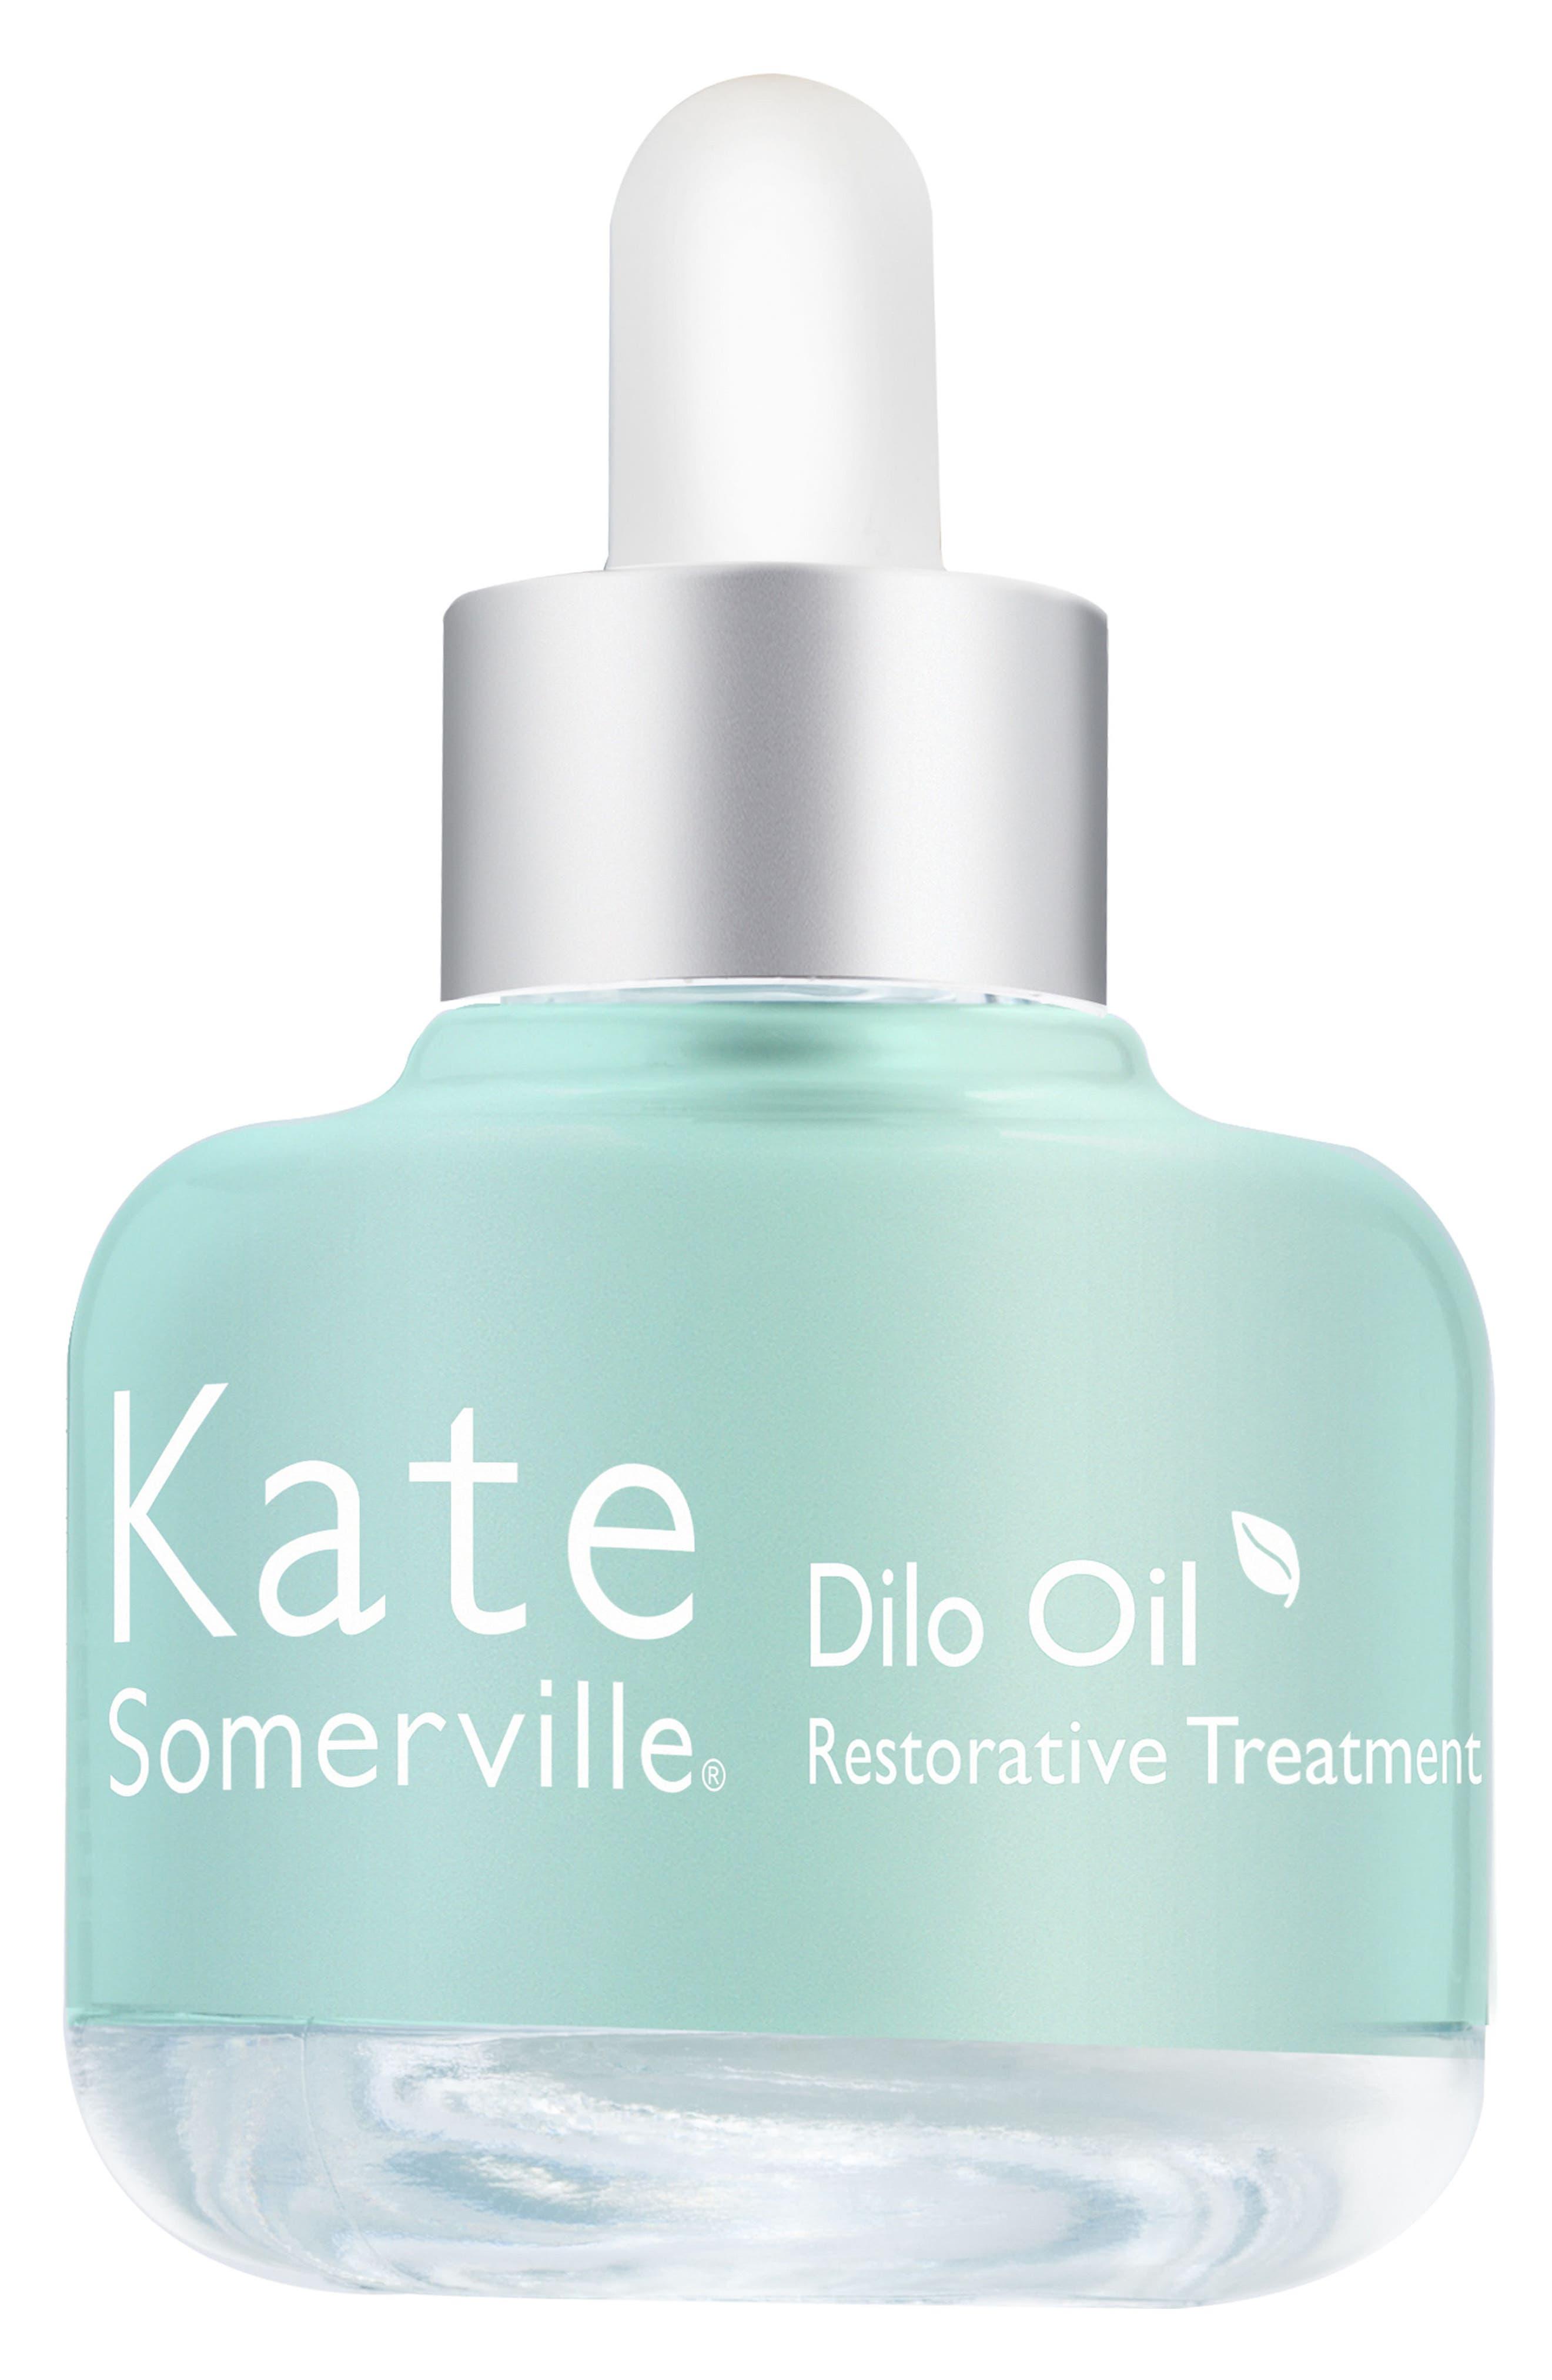 Dilo Oil Restorative Treatment,                         Main,                         color, No Color